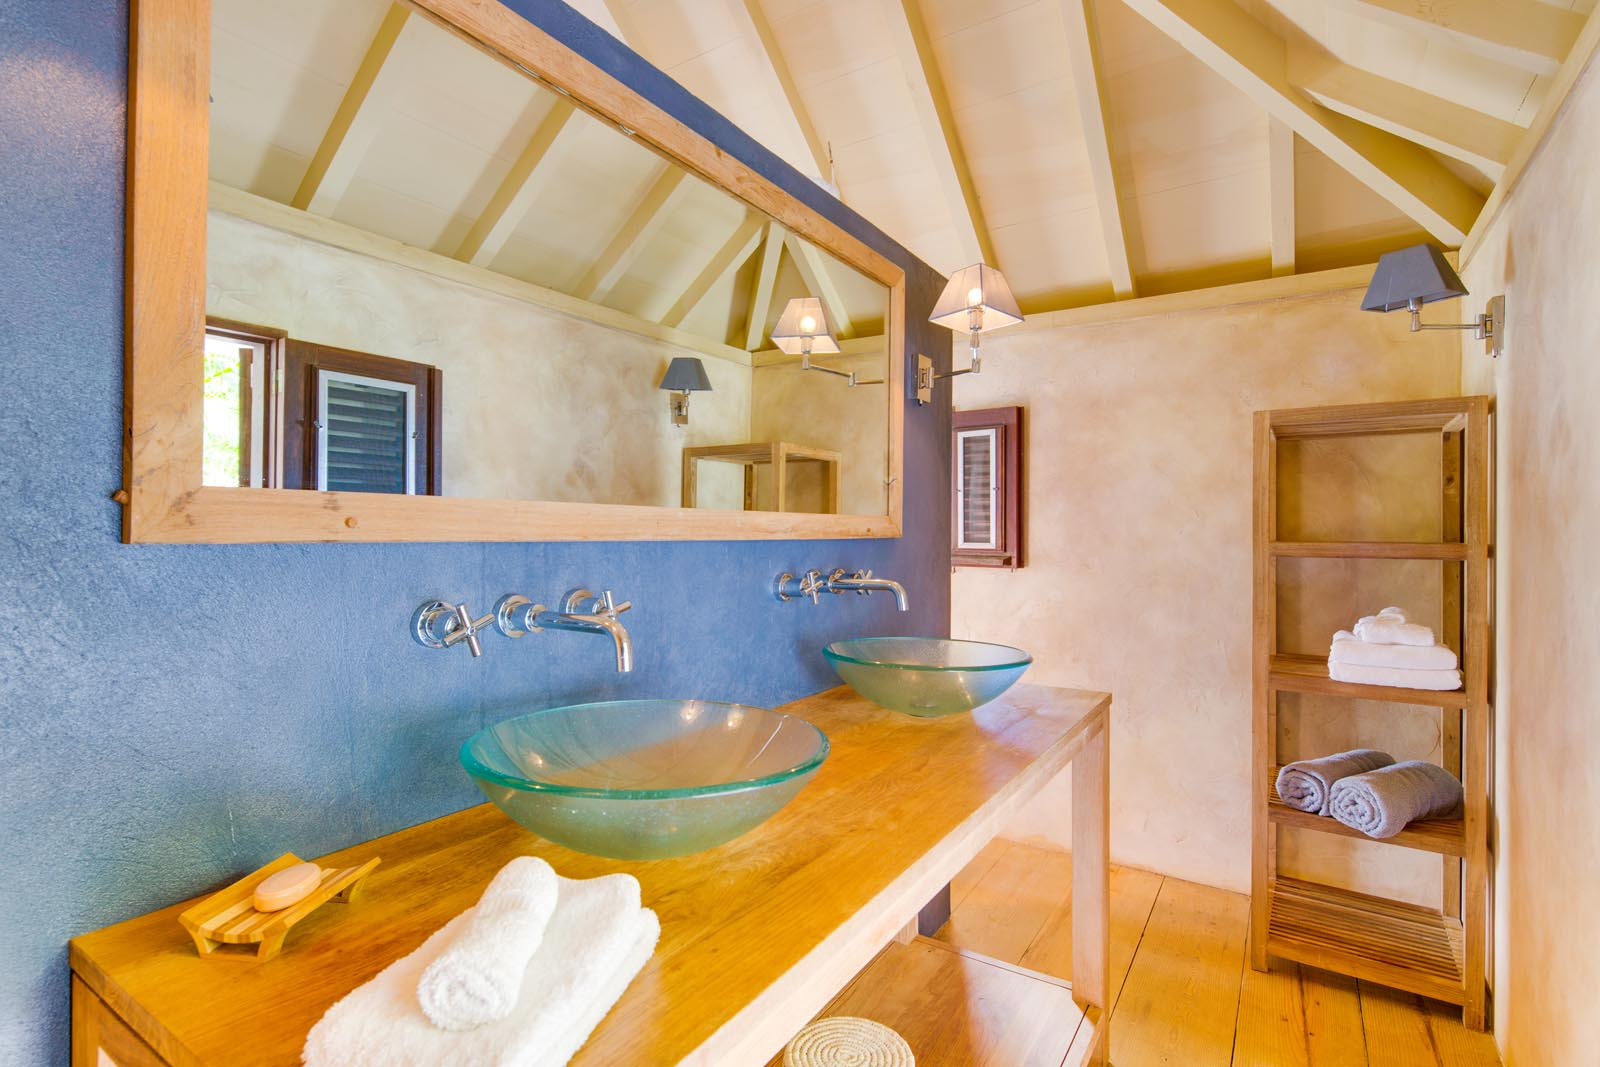 A luxury bathroom at Villa Lama, Flamands Heights, St. Barts, Caribbean.